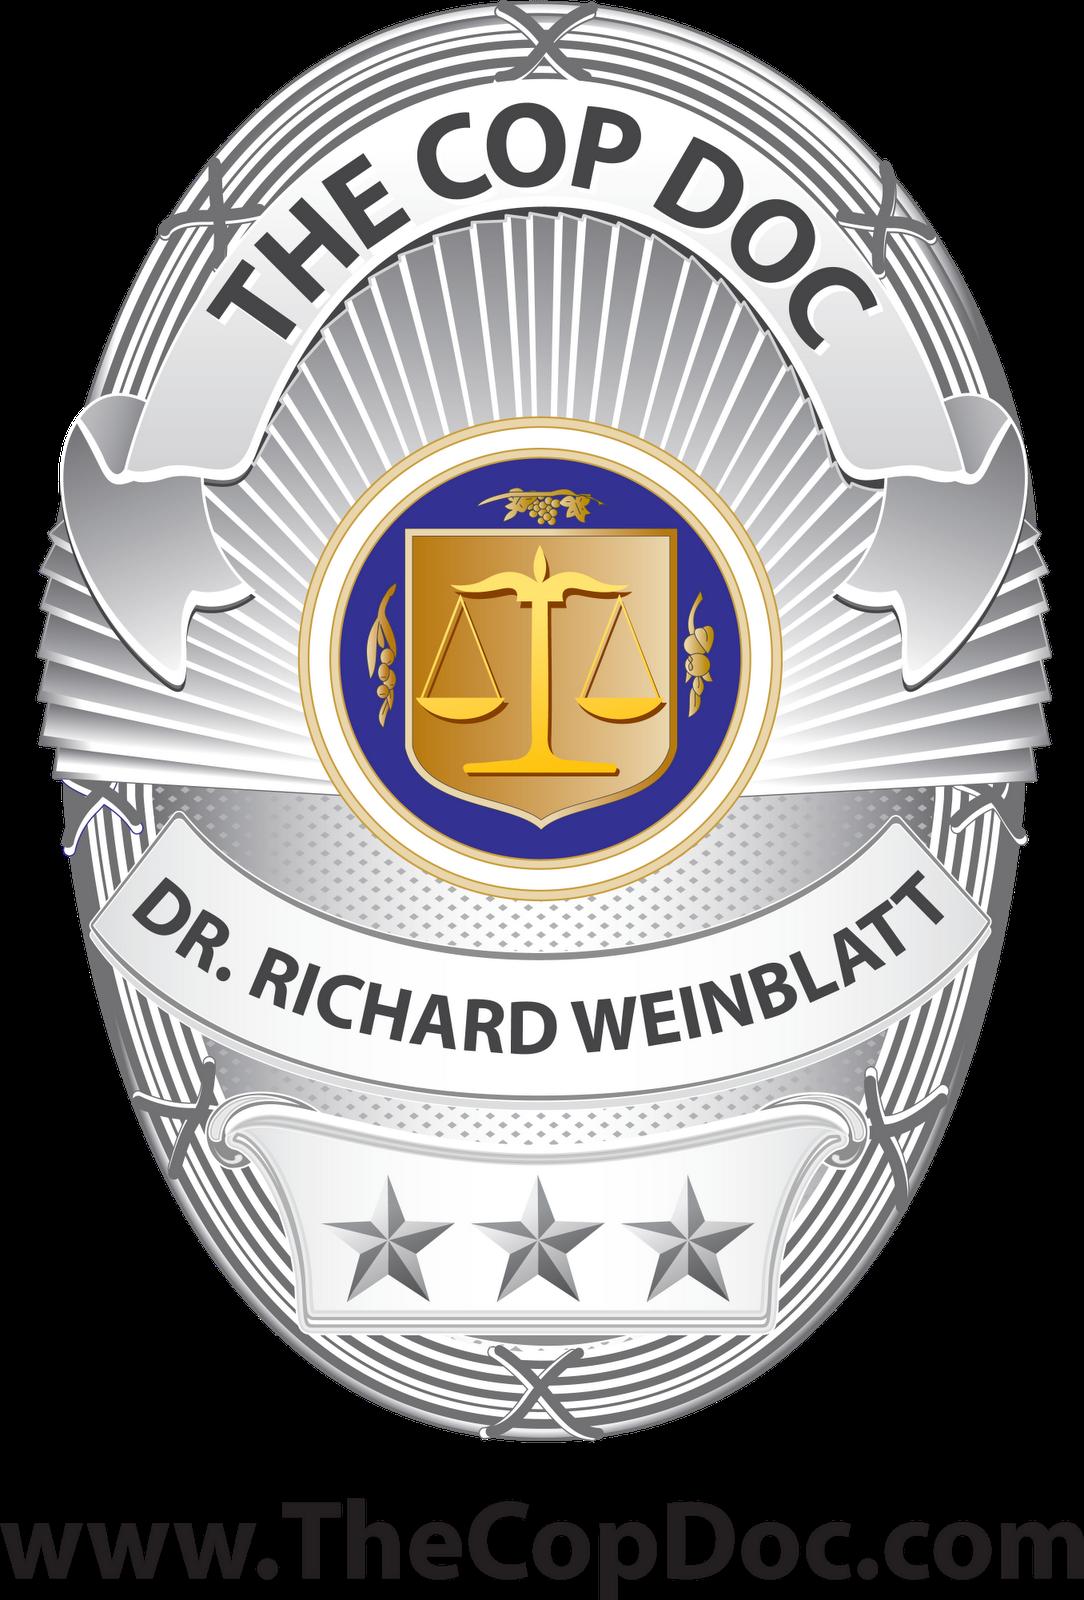 Dr Richard Weinblatt The Cop Doc World Premiere Of New